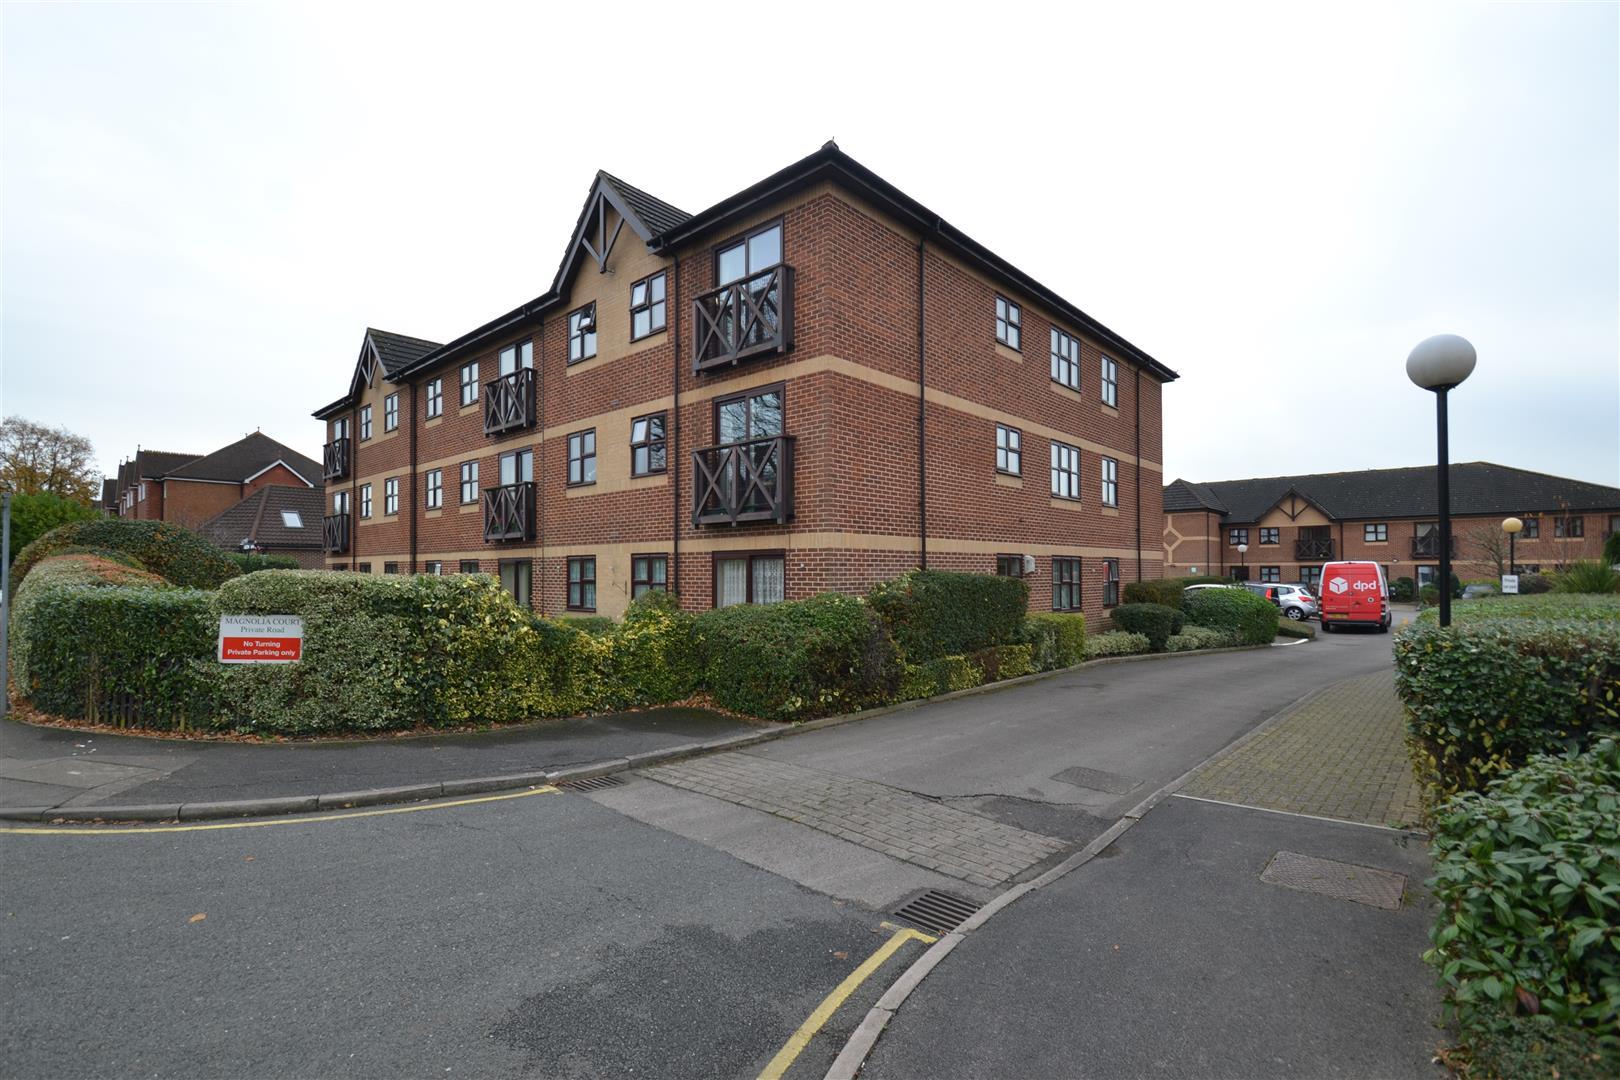 2 Bedrooms Retirement Property for sale in Victoria Road, Horley